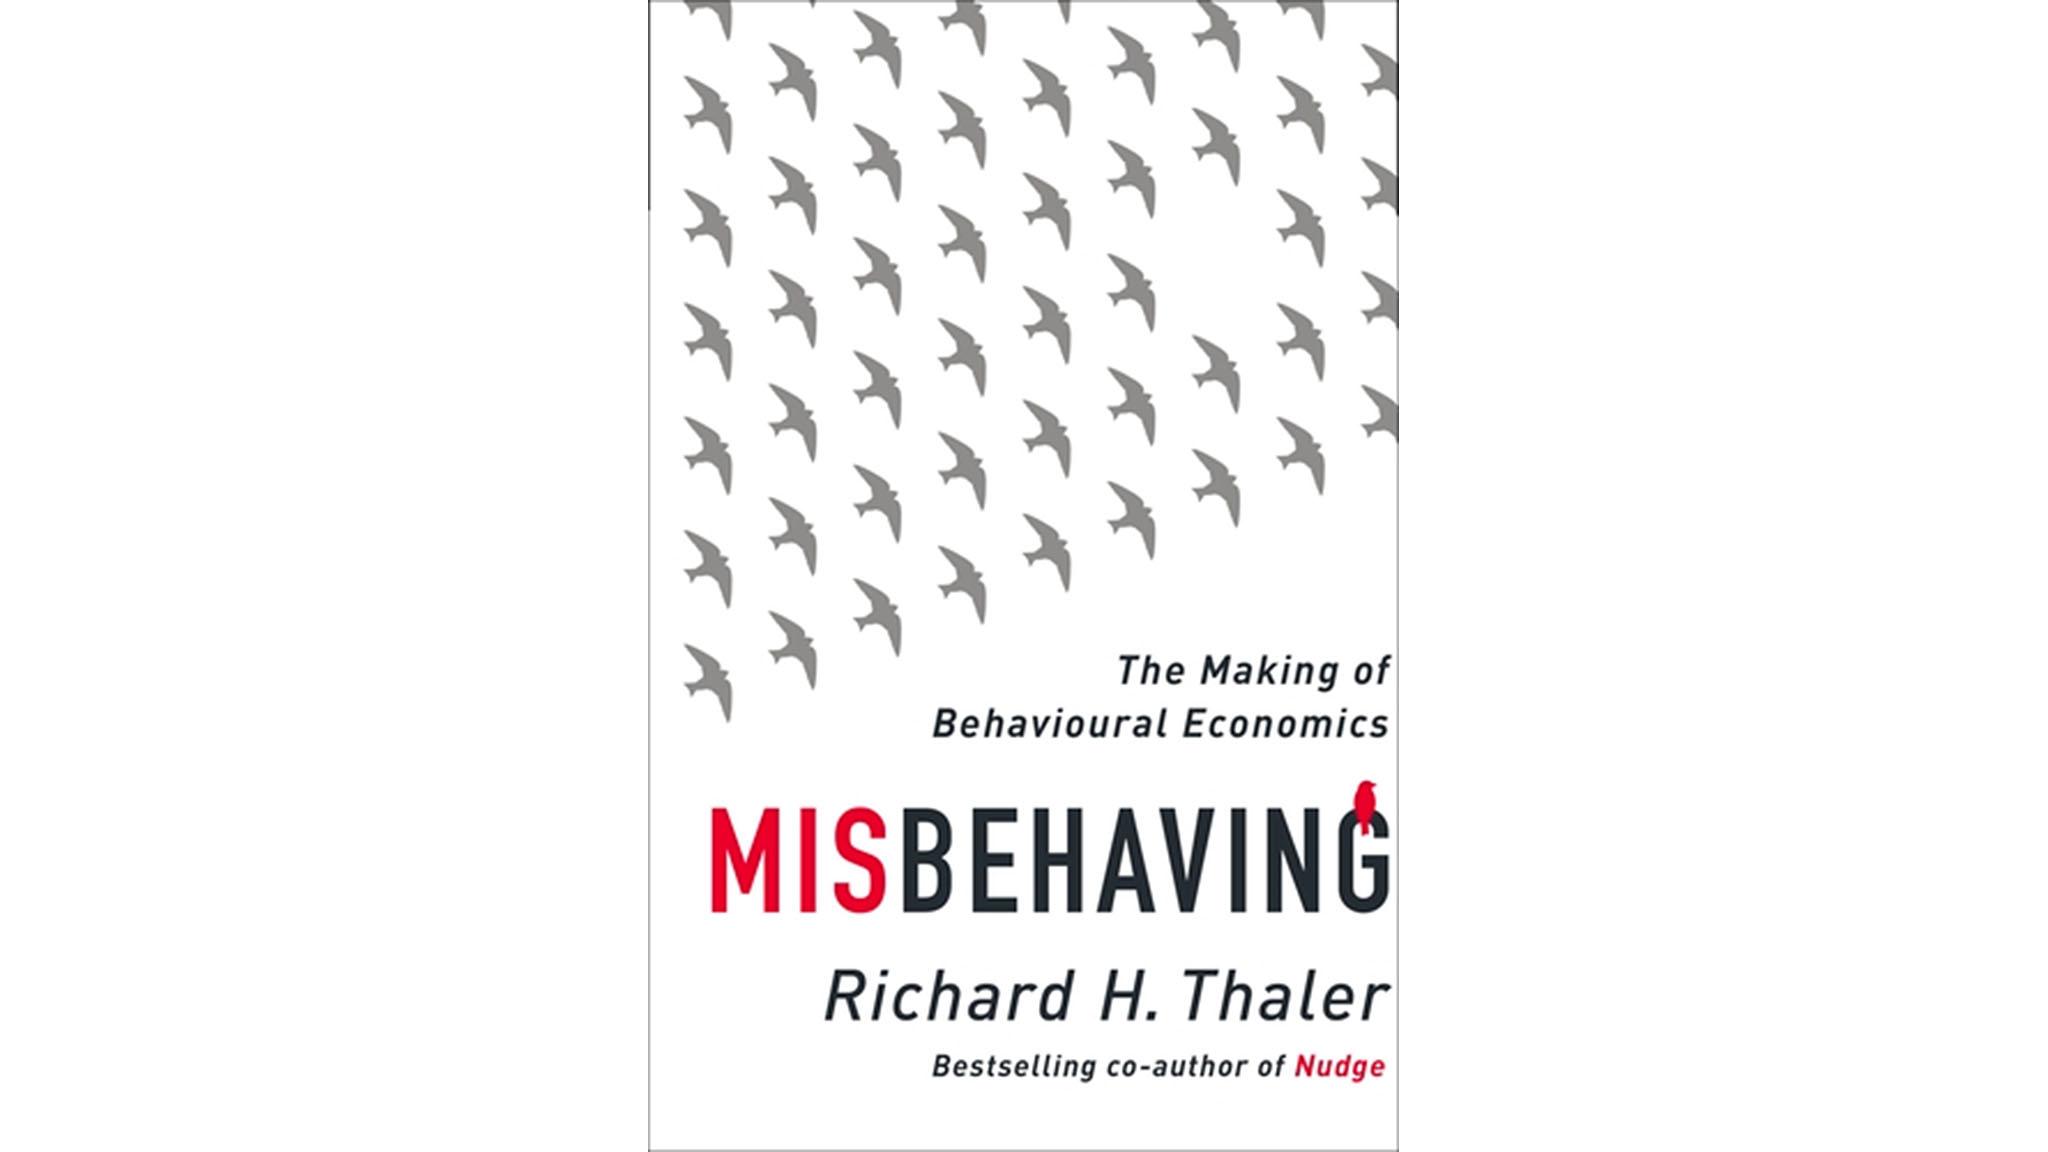 Misbehaving the making of behavioural economics by richard thaler misbehaving the making of behavioural economics by richard thaler financial times fandeluxe Gallery